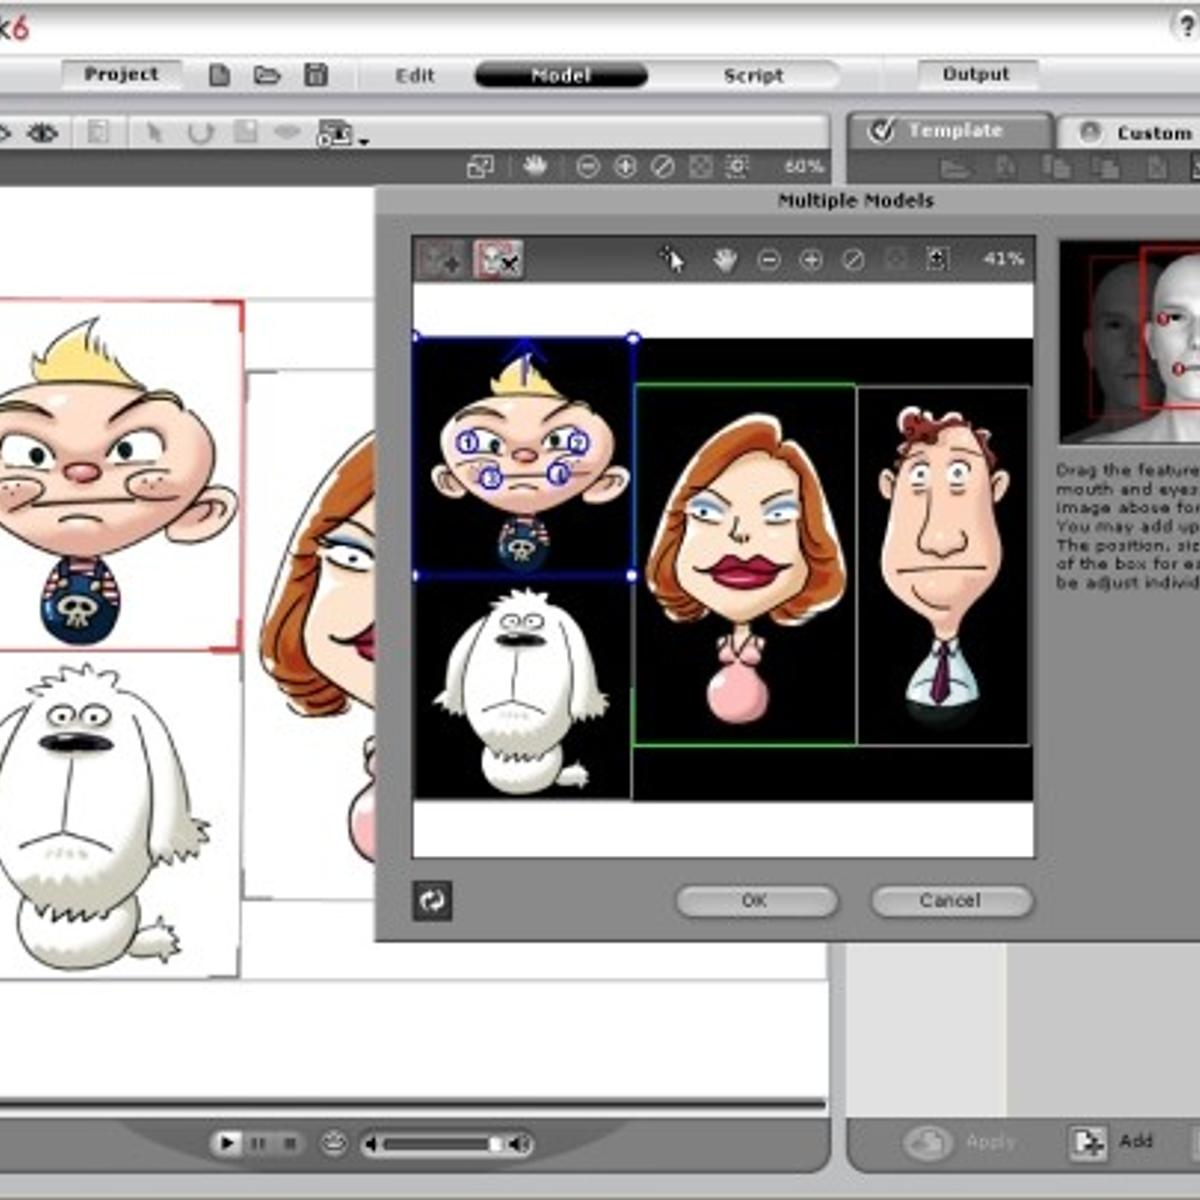 CrazyTalk Animator Alternatives and Similar Software